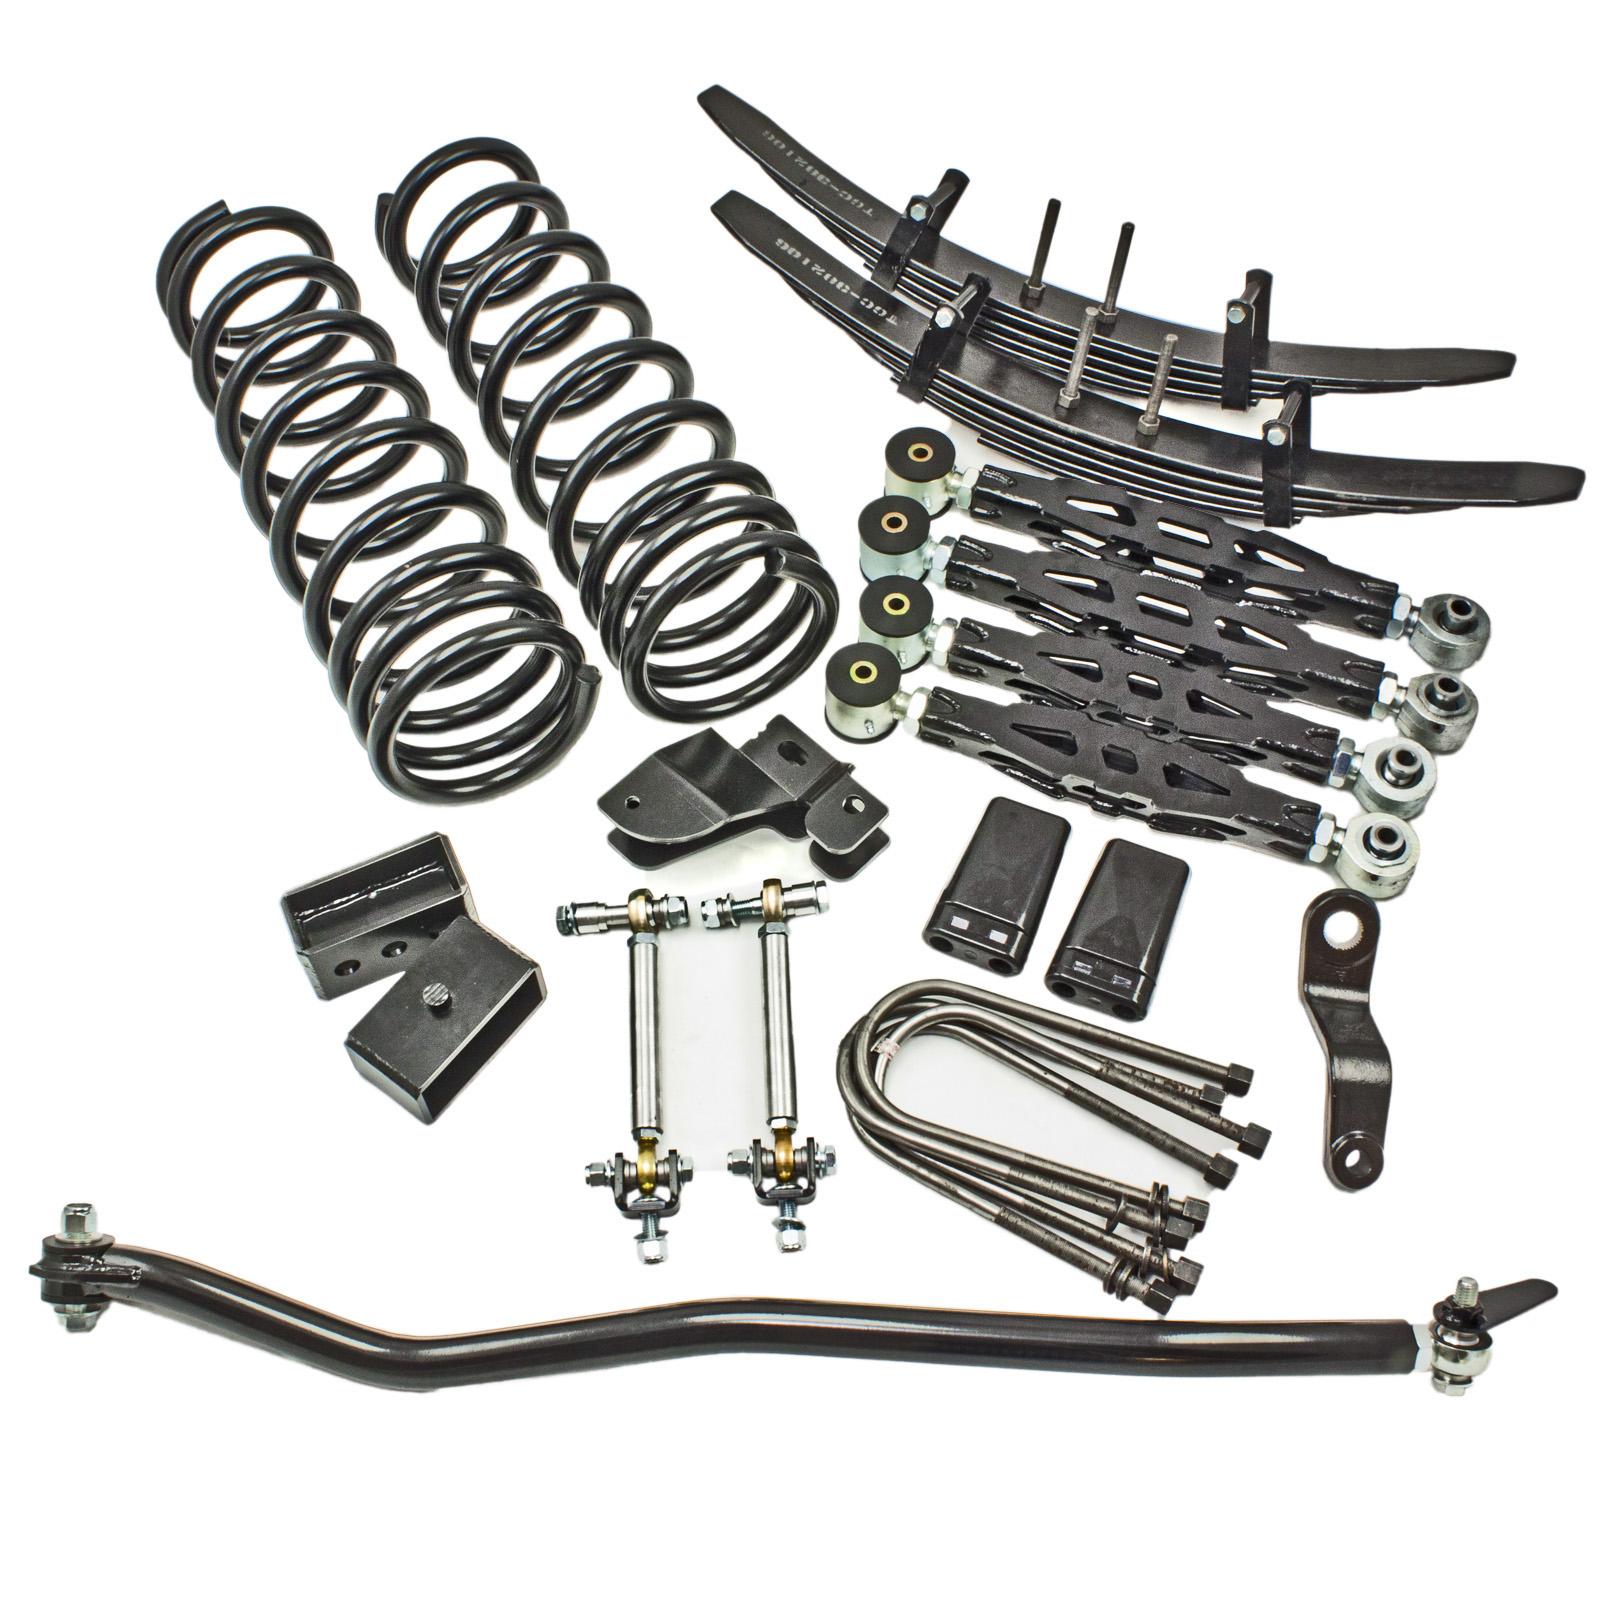 Dodge Lift Kit For 2010 Dodge Ram 2500 Truck Lift Kits